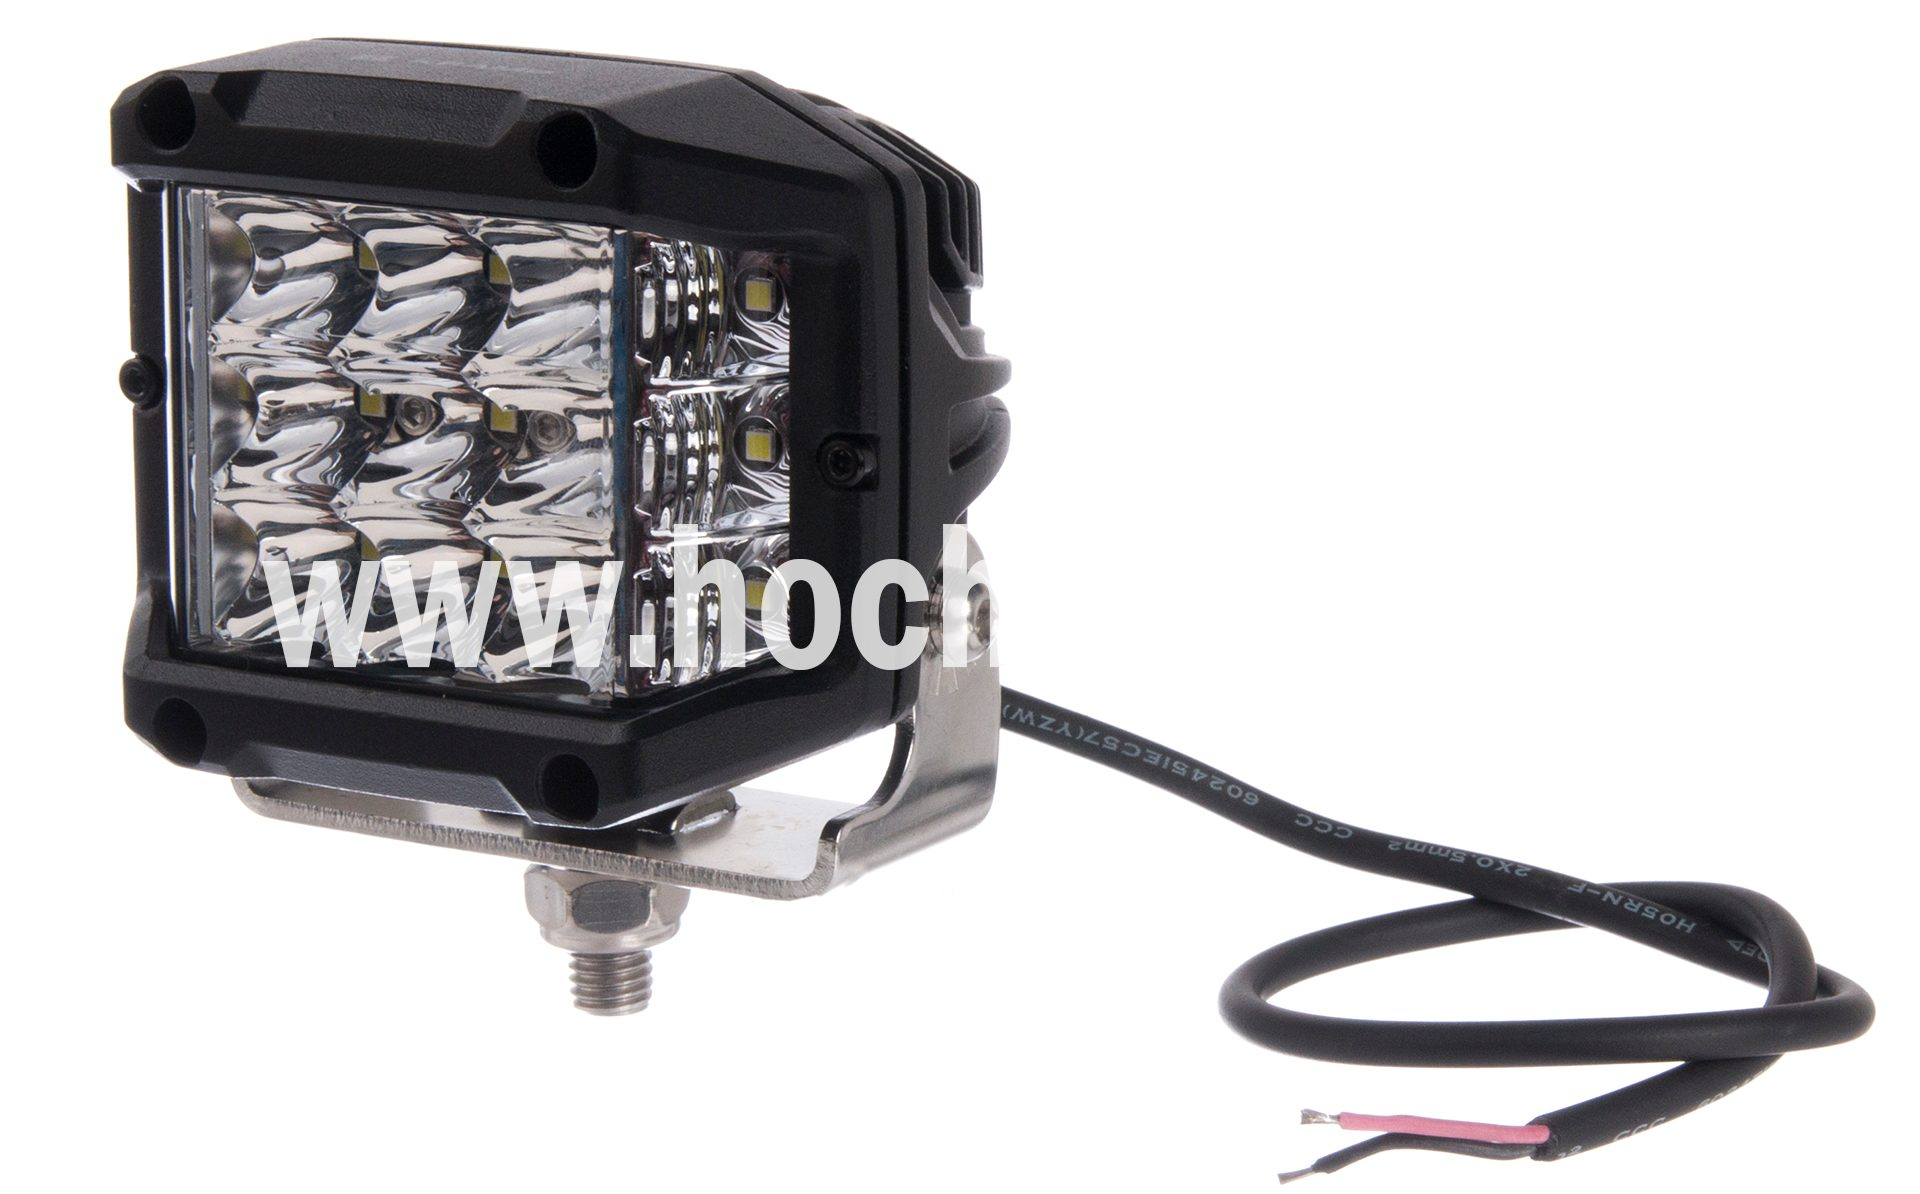 Led-Kombi-Scheinwerfer 2850 Lm (La10094)  Kramp